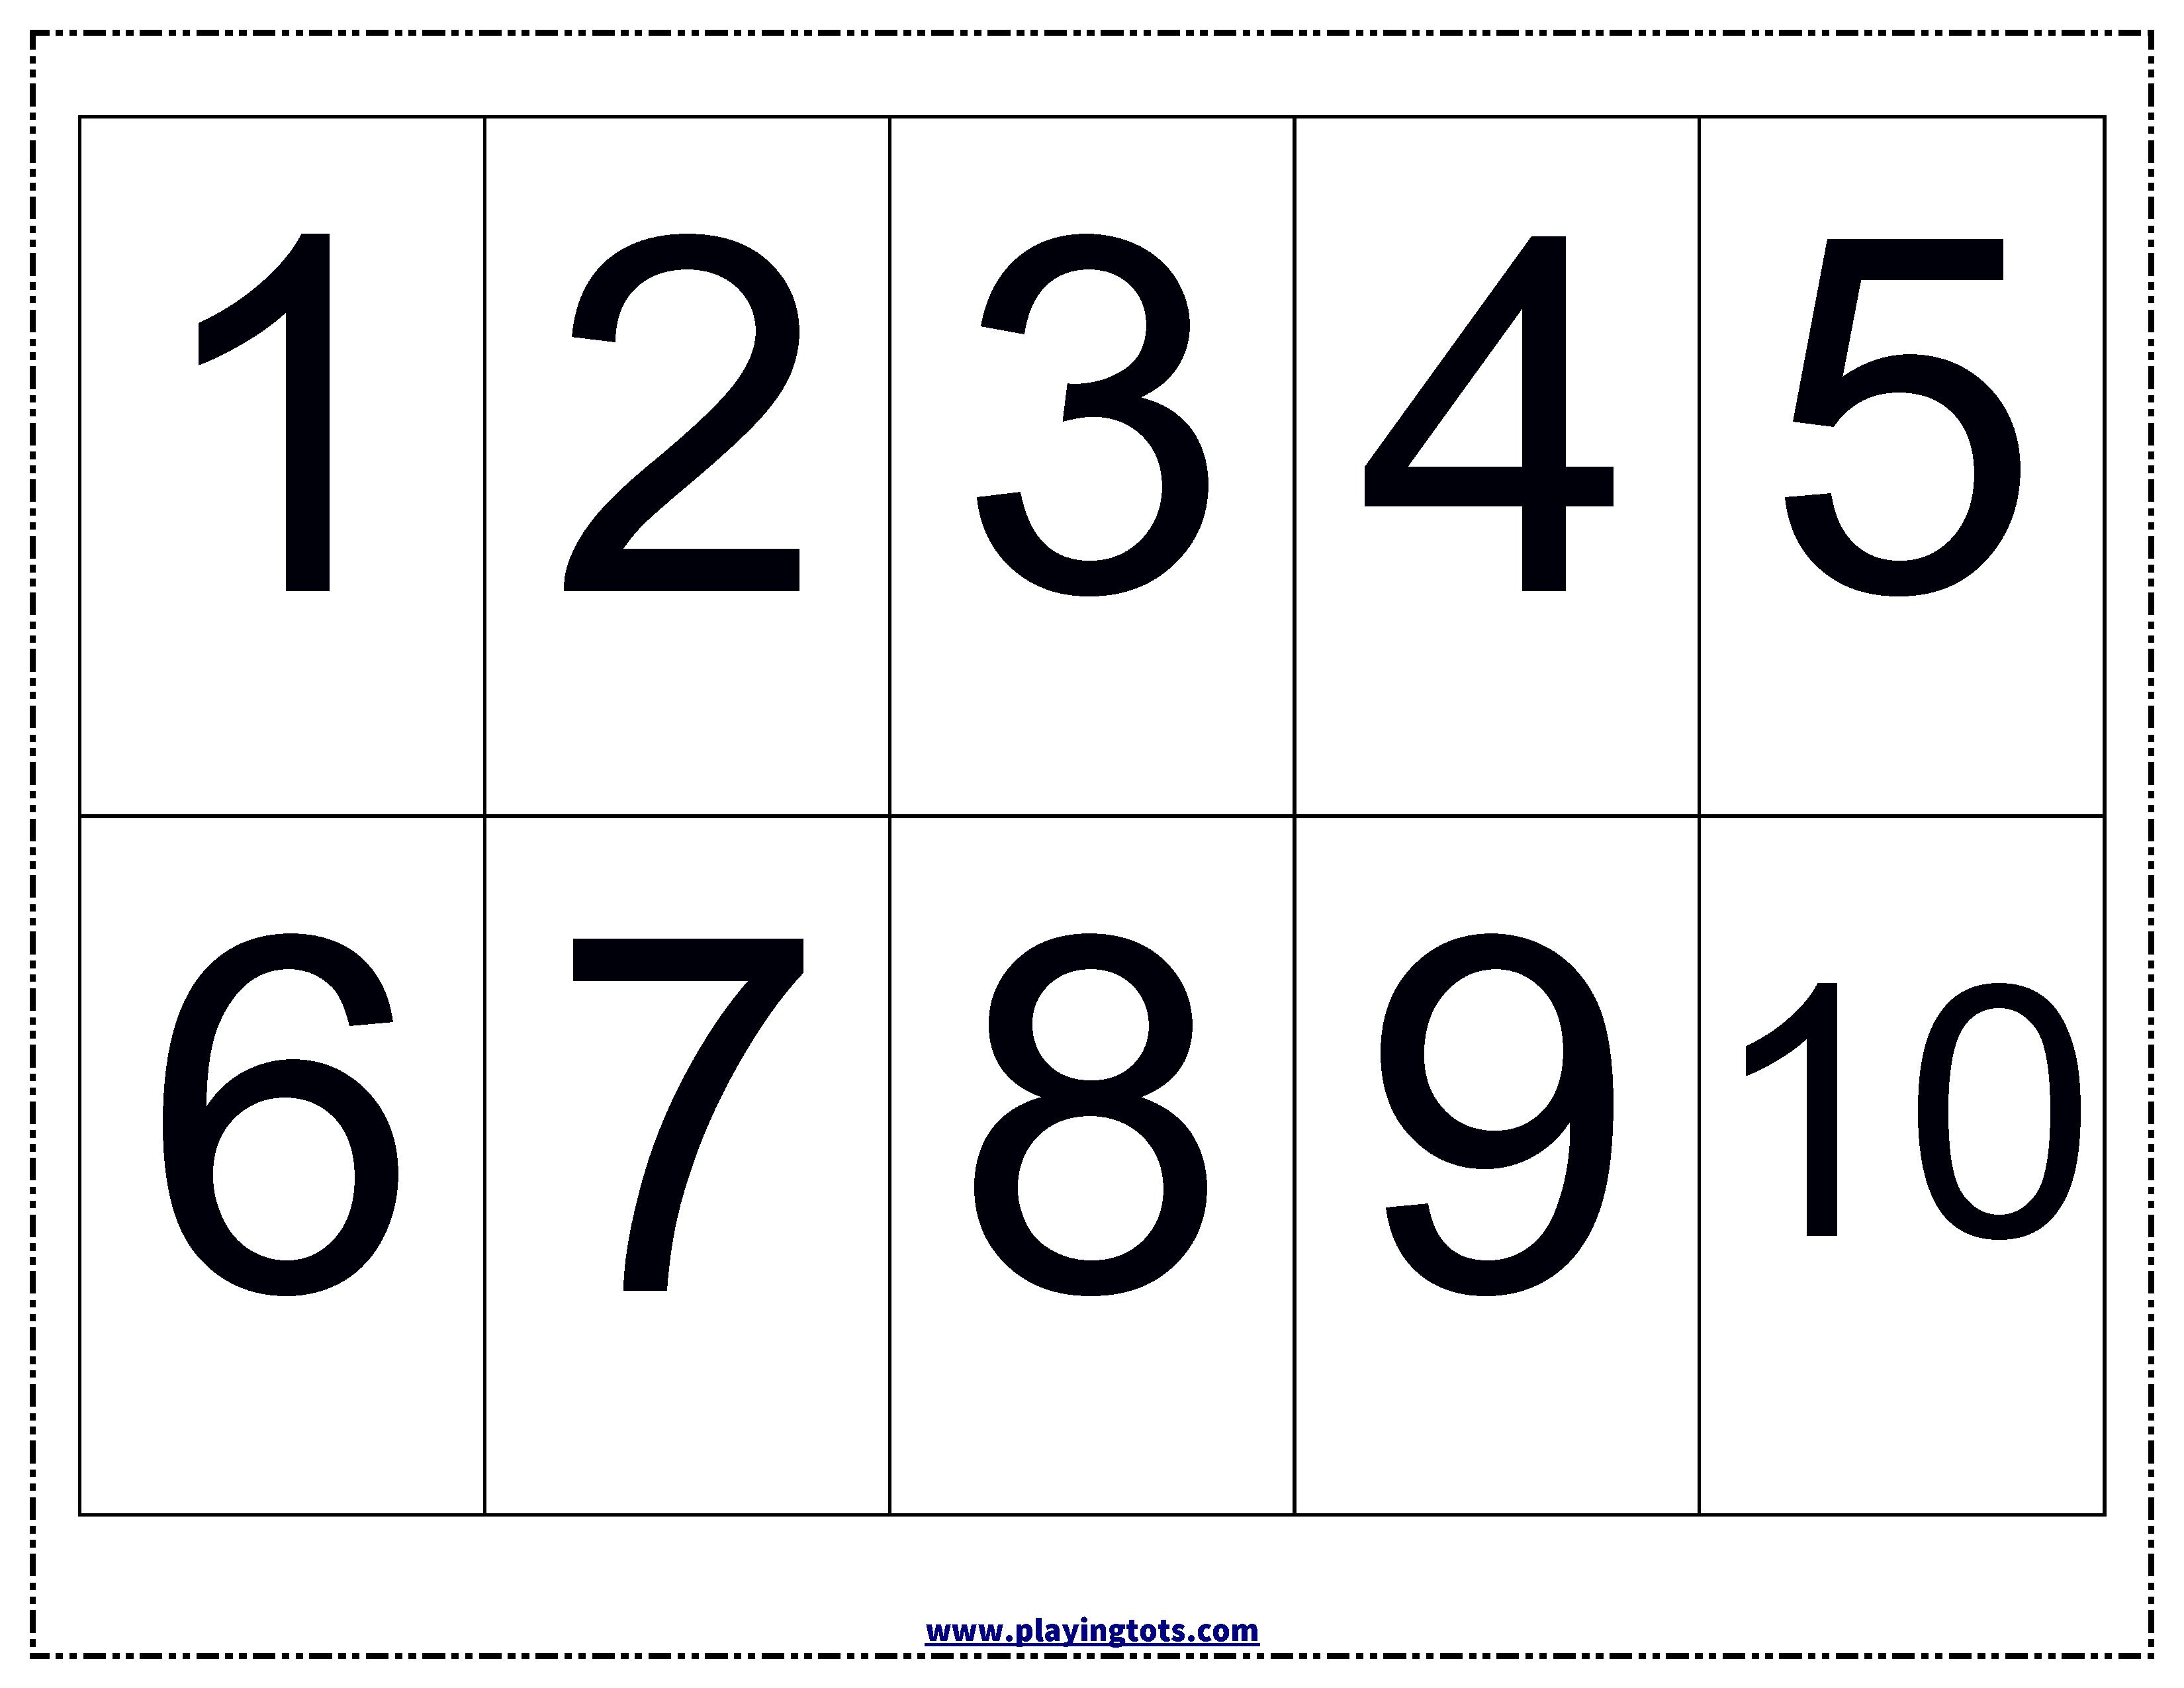 Numbers Chart Keywords:free, Printable,pdf,free,printable,learn | Free Printable Toddler Learning Worksheets